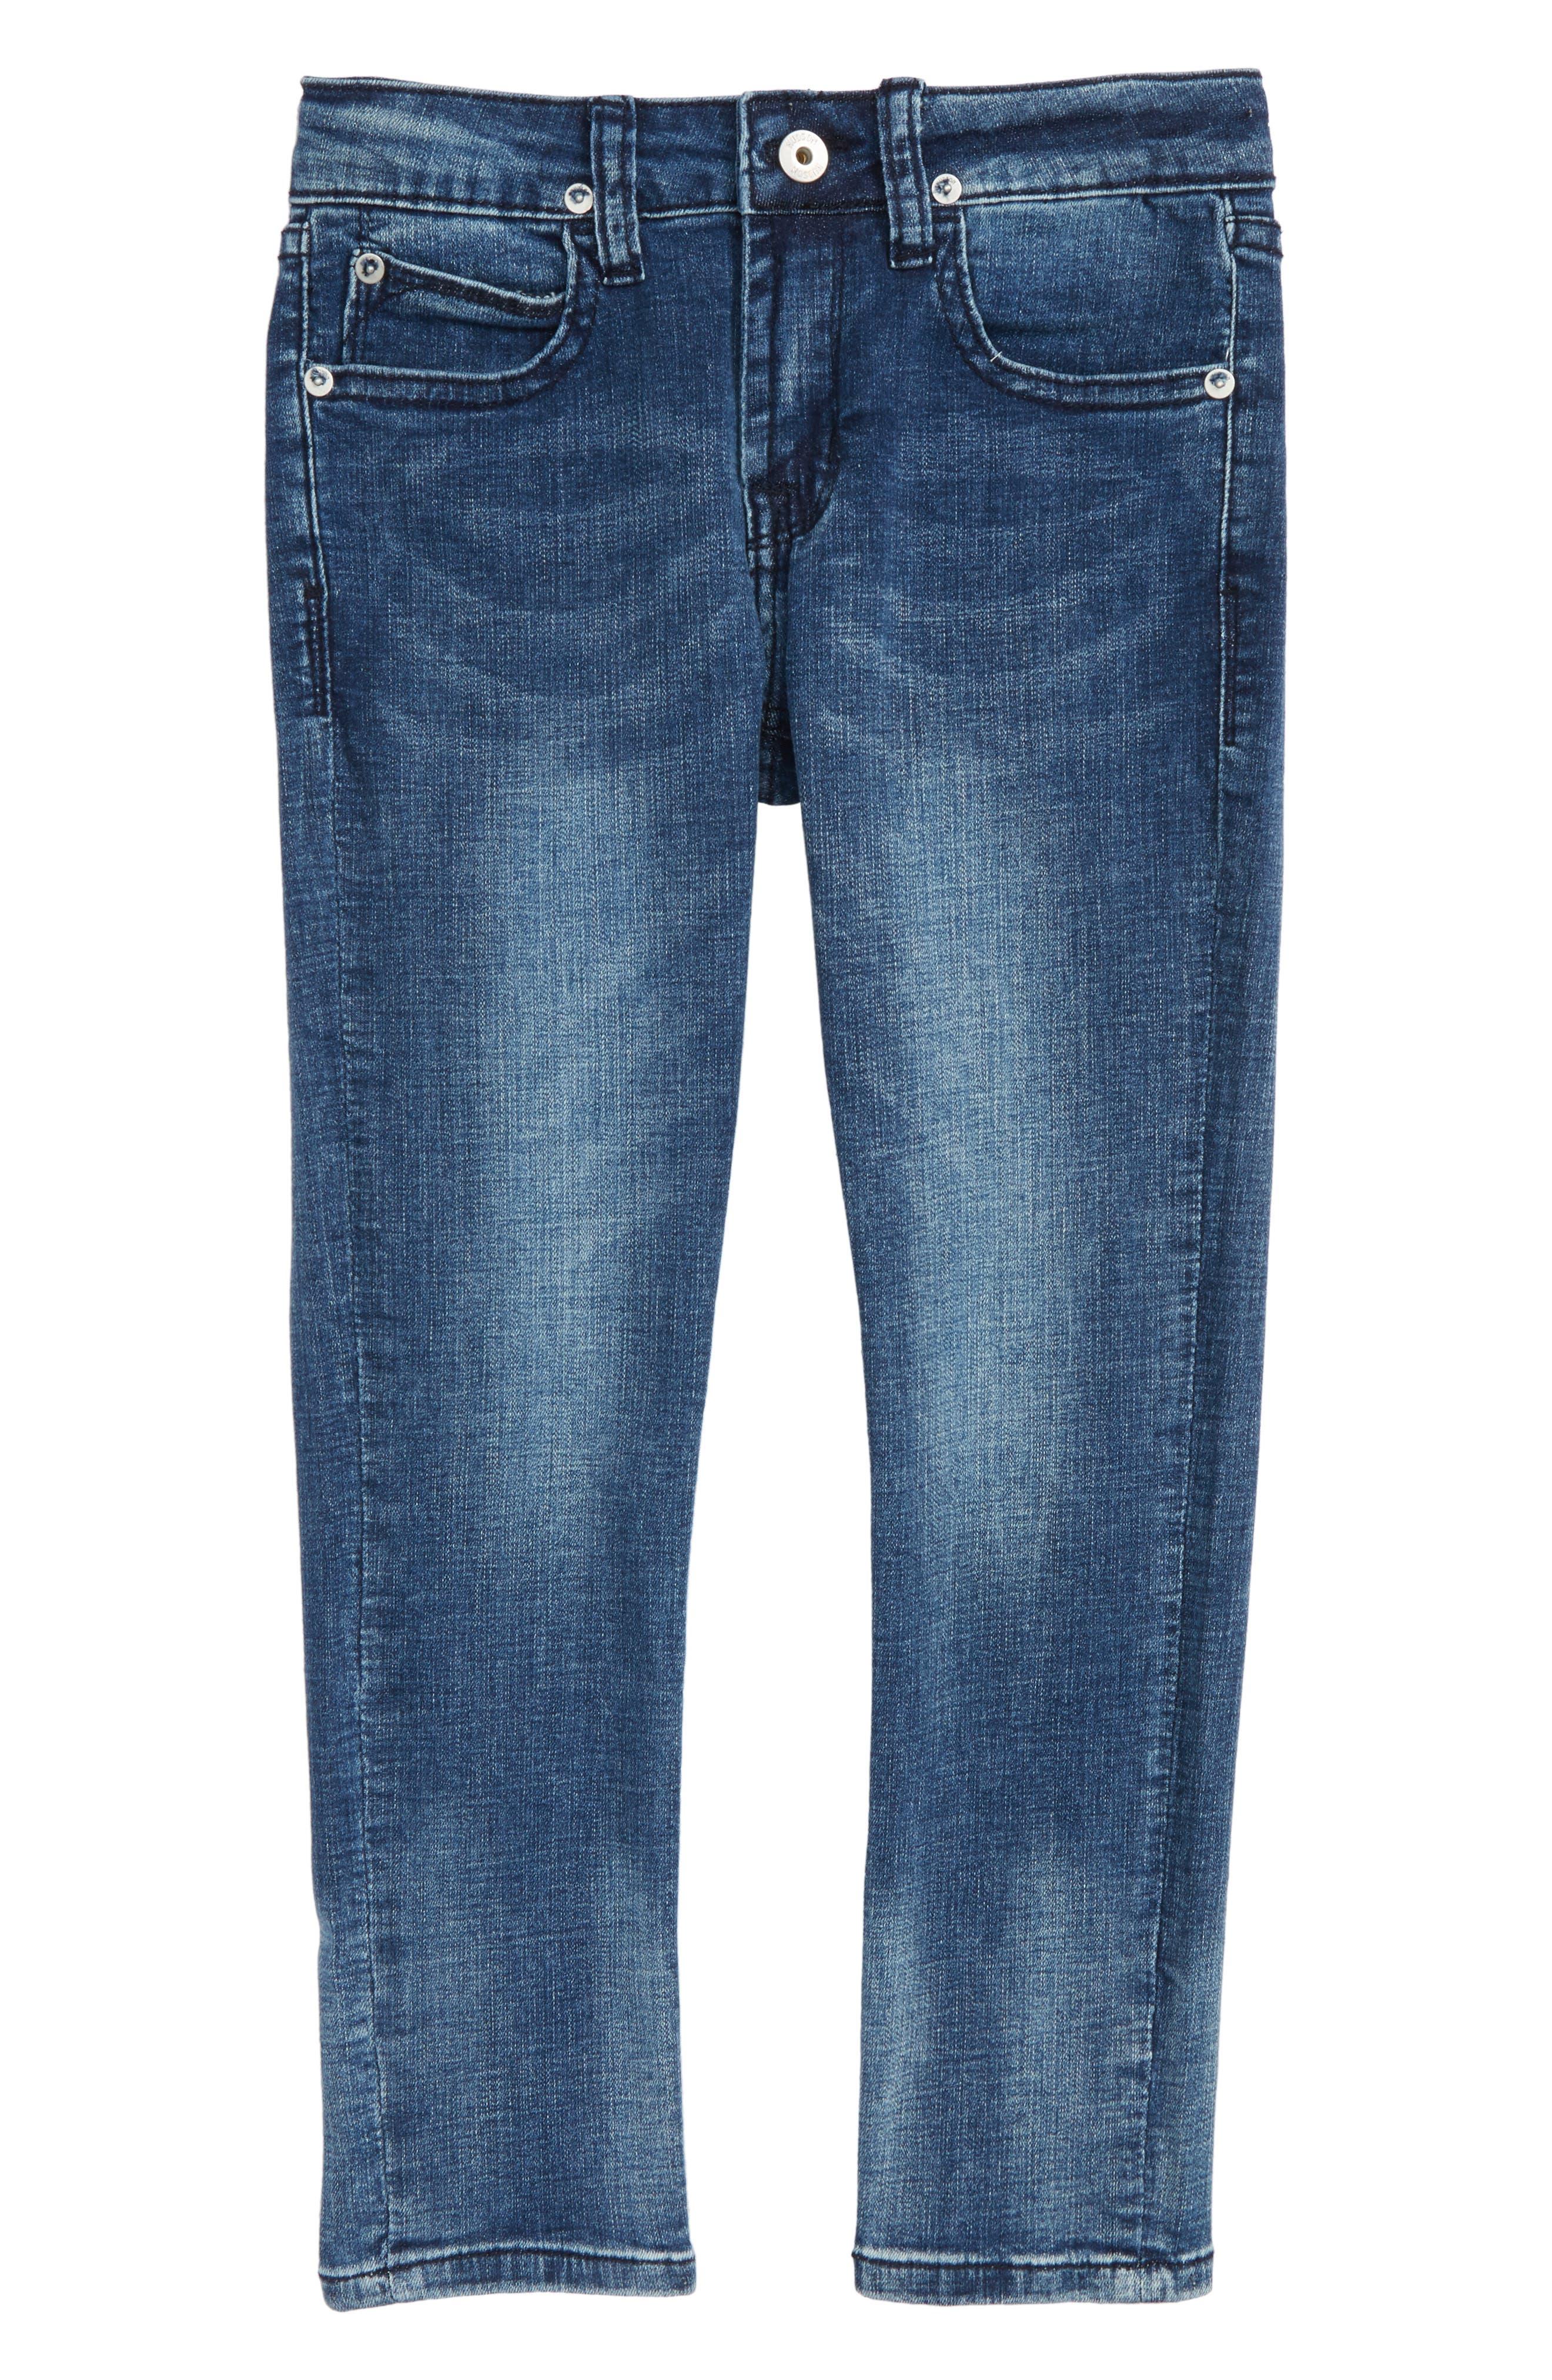 Jagger Slim Fit Straight Leg Jeans,                         Main,                         color, Desert Wash